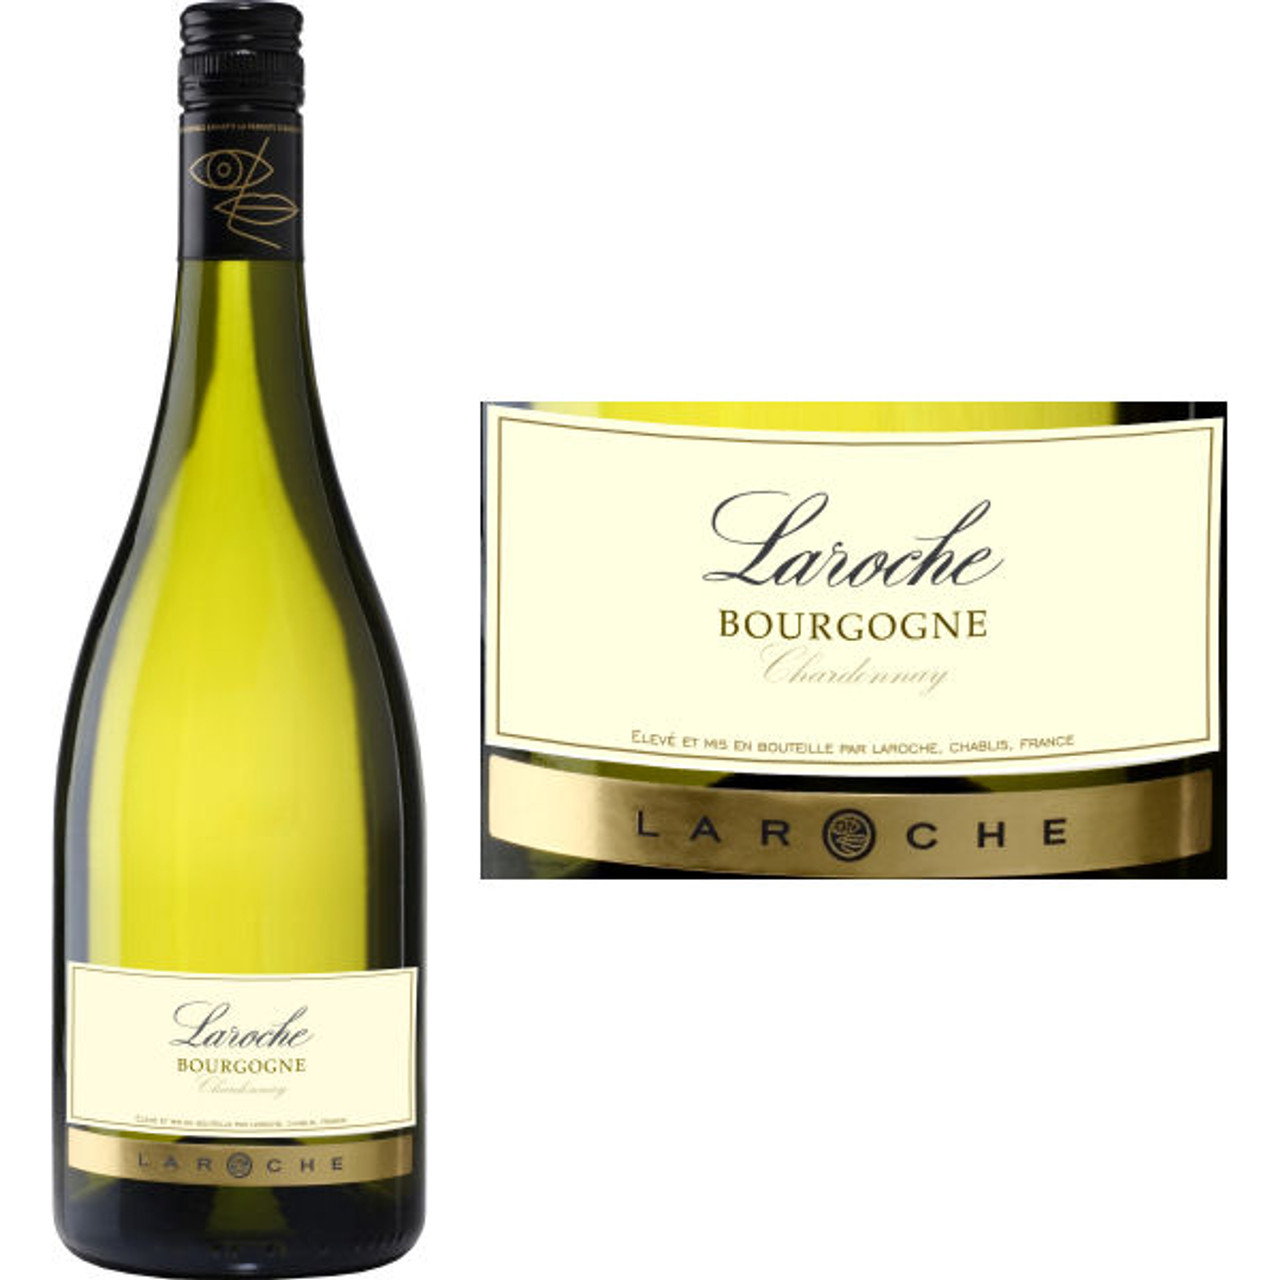 Domaine Laroche Bourgogne Chardonnay